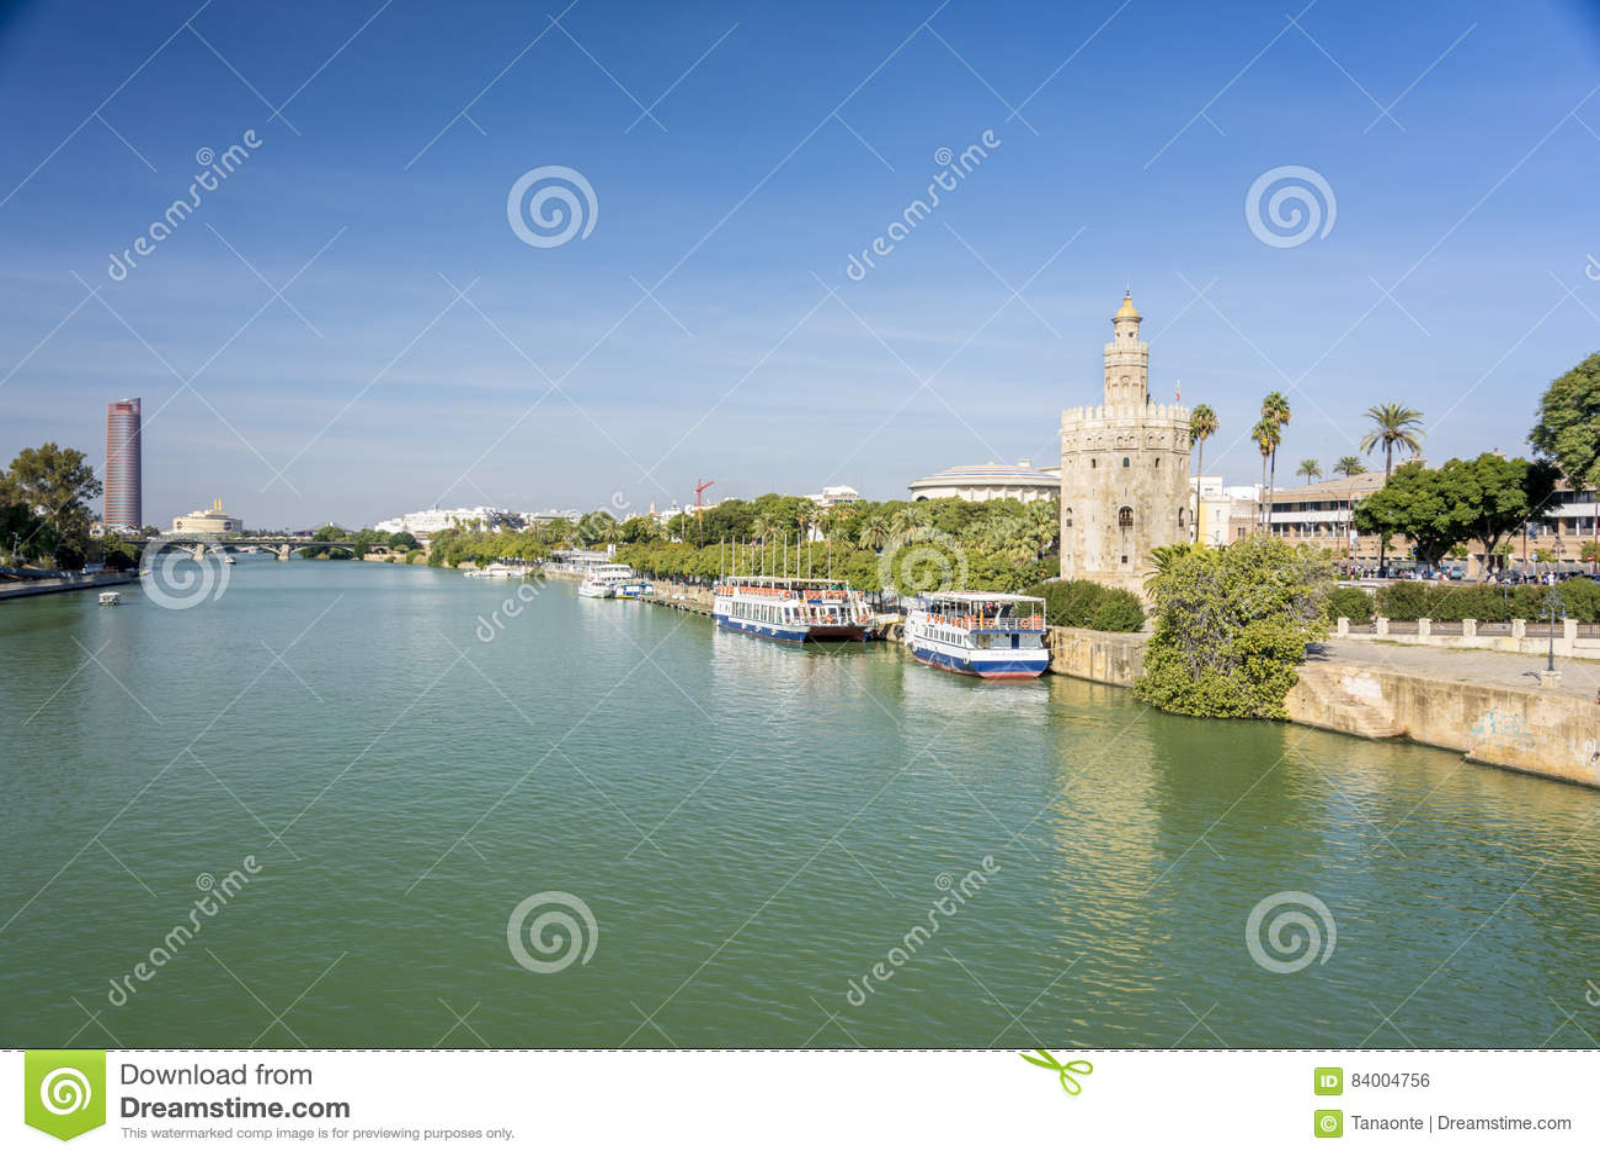 Golden tower or Torre del Oro, along the Guadalquivir river, Seville, Spain.